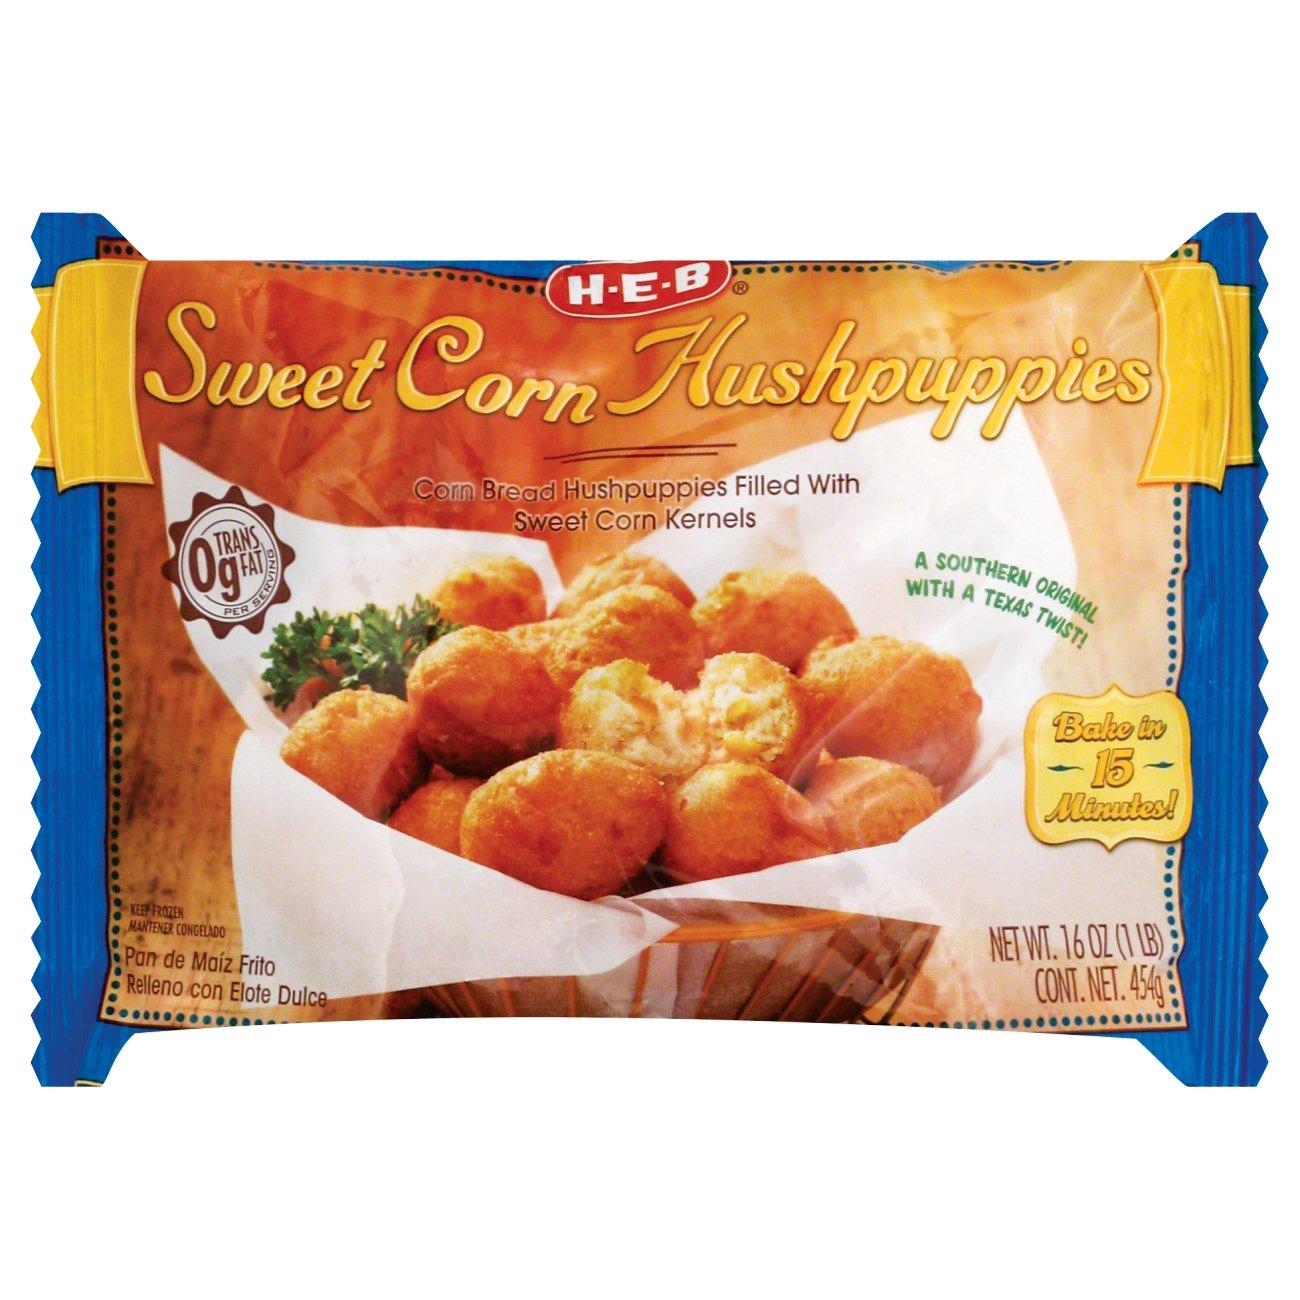 H E B Sweet Corn Hushpuppies Shop Entrees Sides At H E B